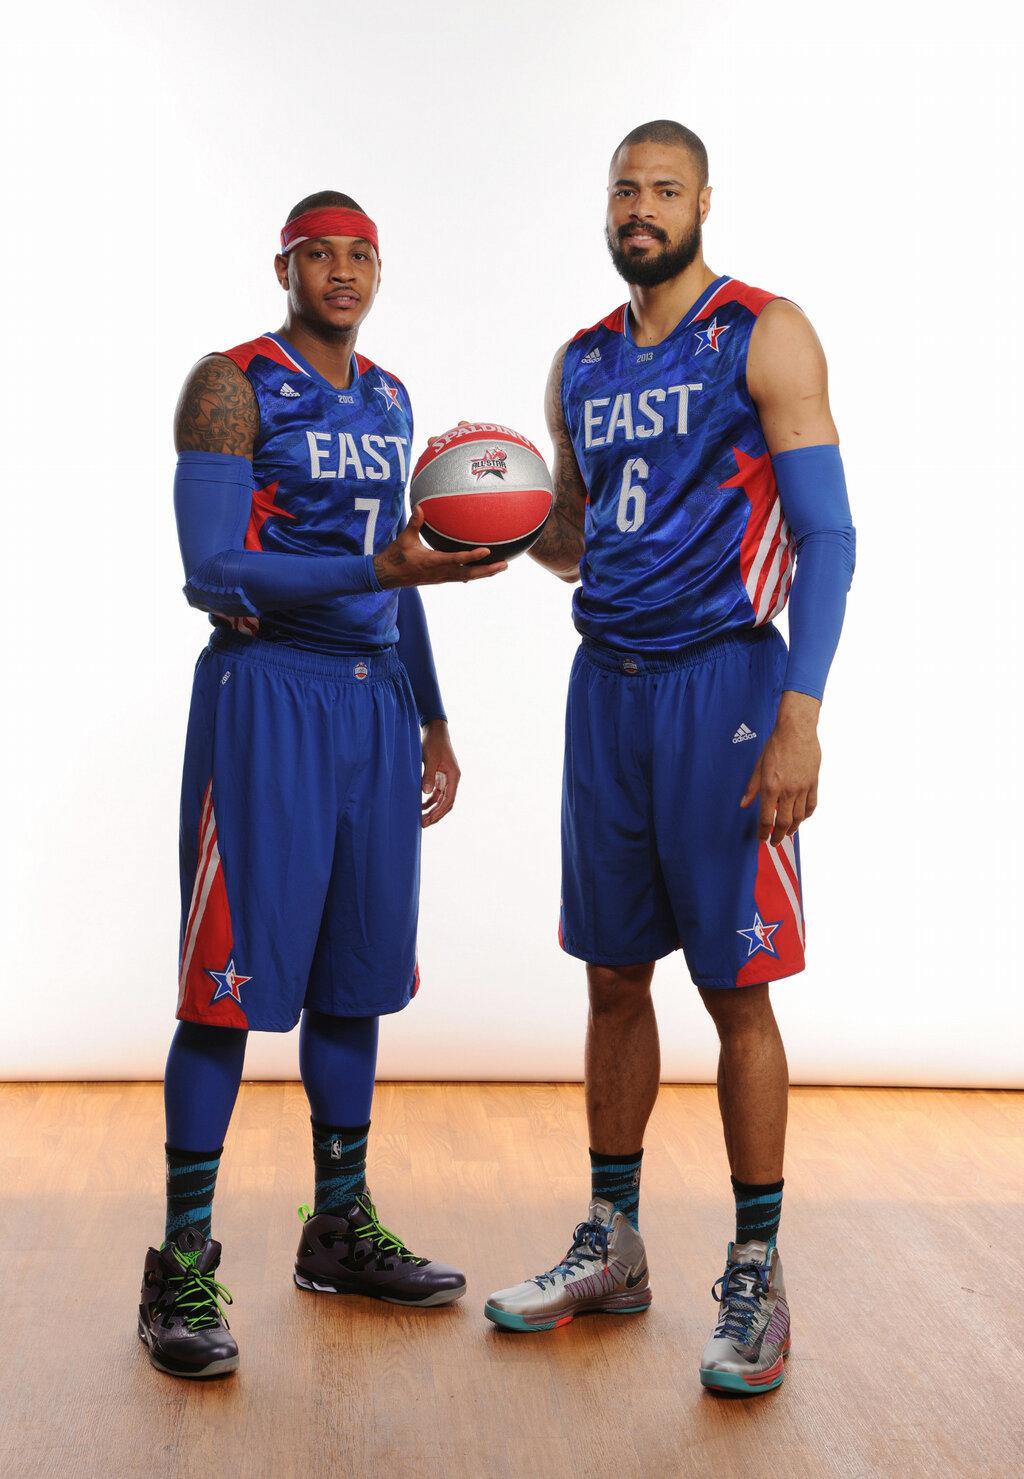 ¿Cuánto mide Carmelo Anthony? - Altura - Real height Tumblr_mie9mu2sWX1qfgi90o1_1280